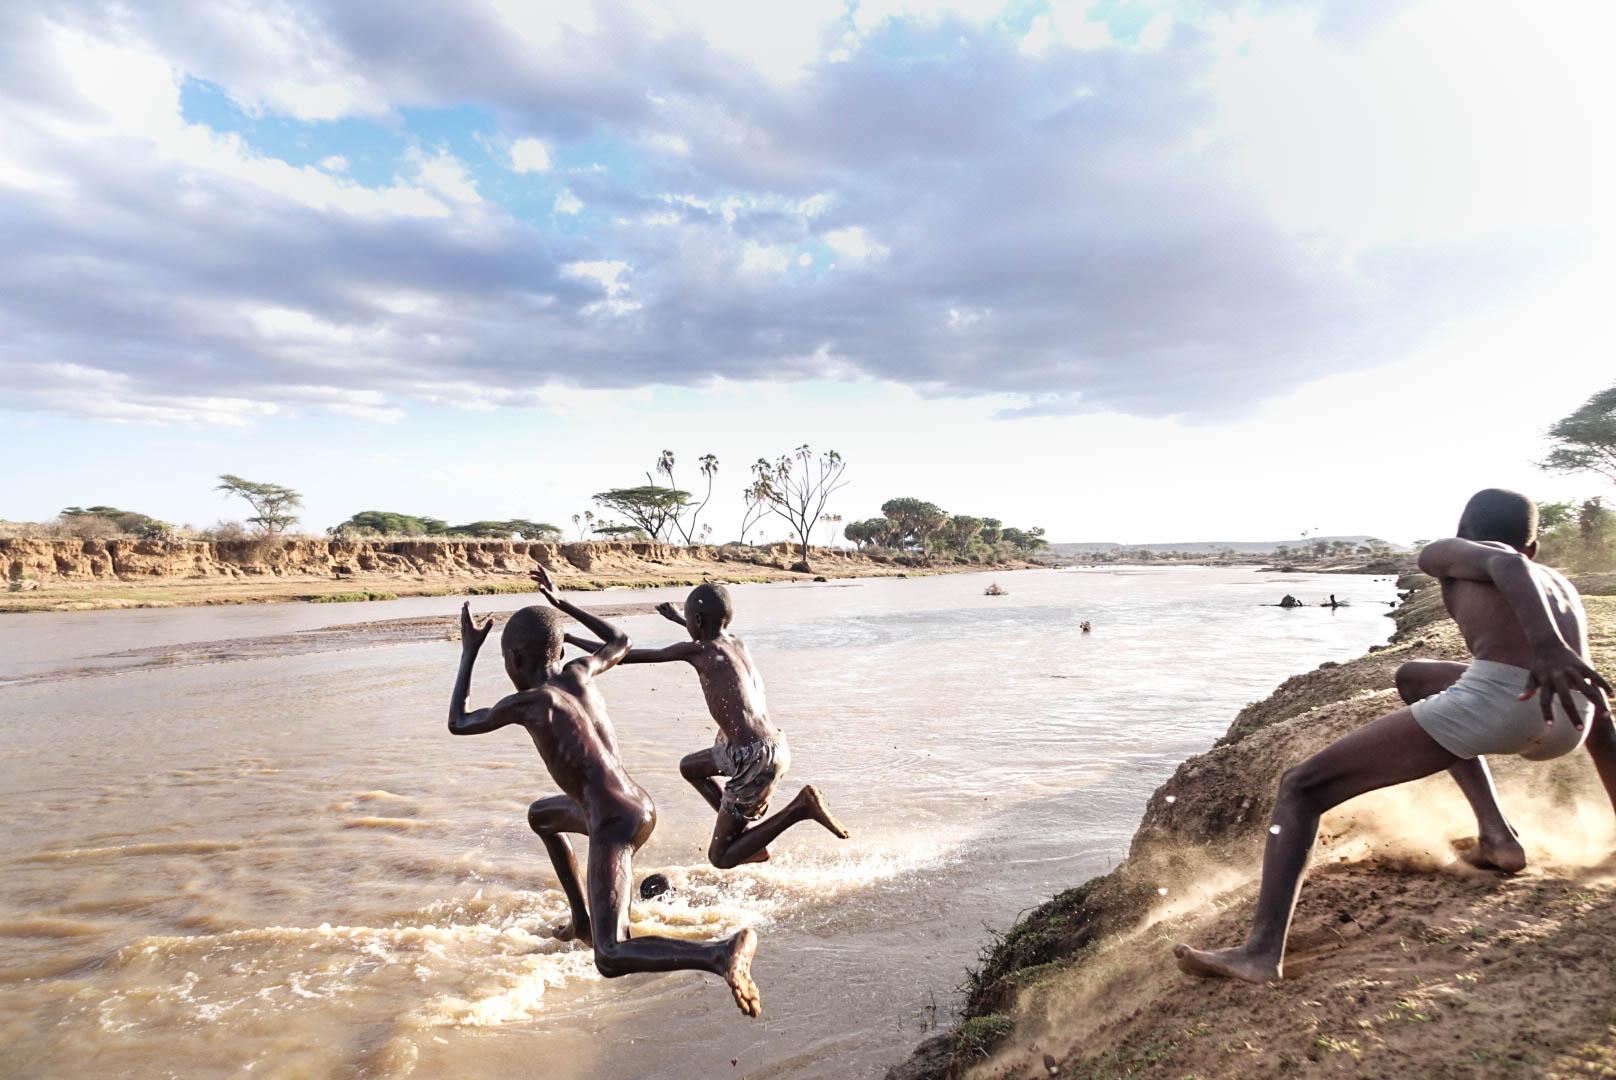 Samburu river play (1 of 1).jpg